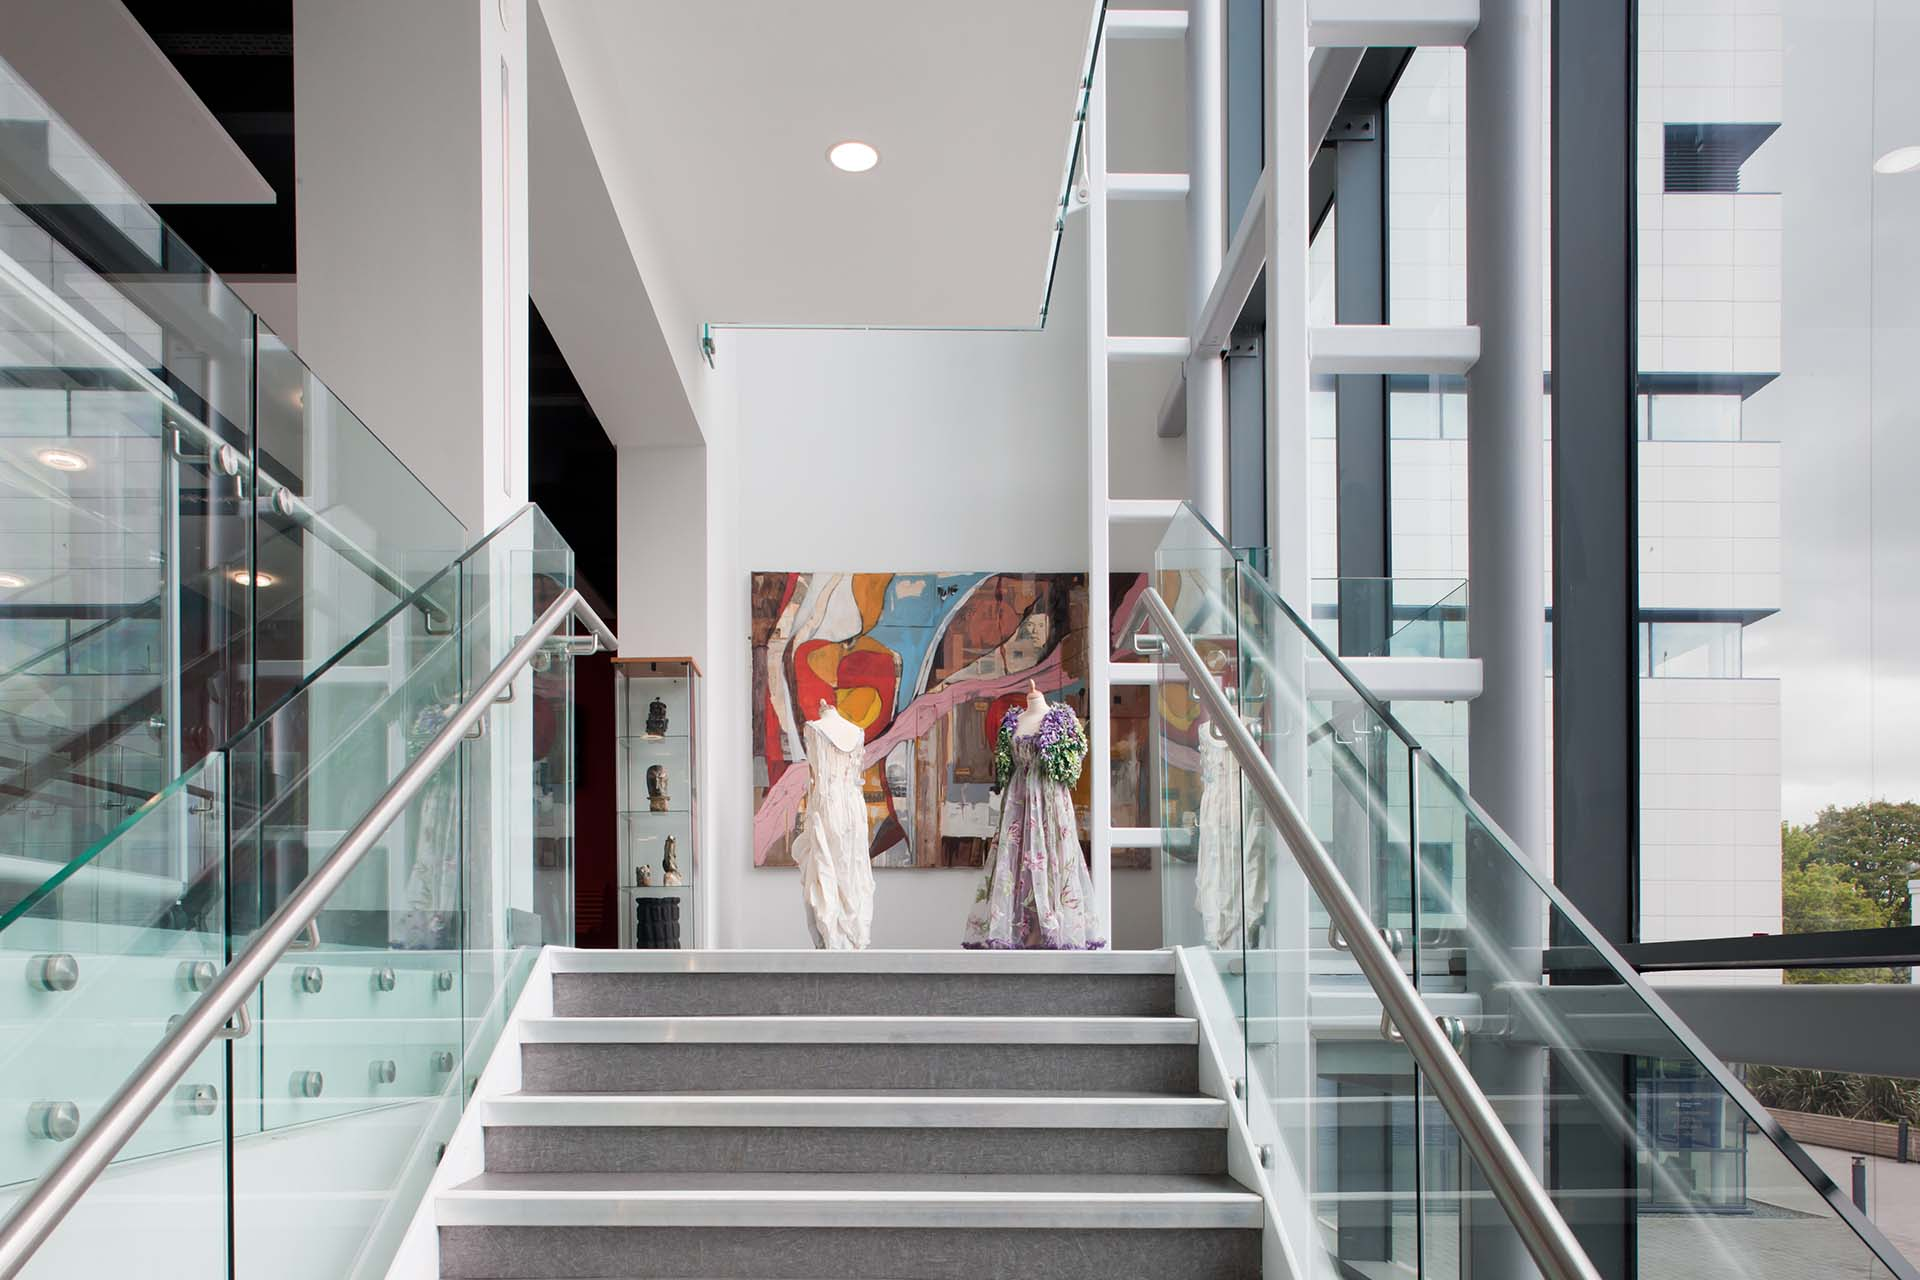 Grimsby Art and Design School